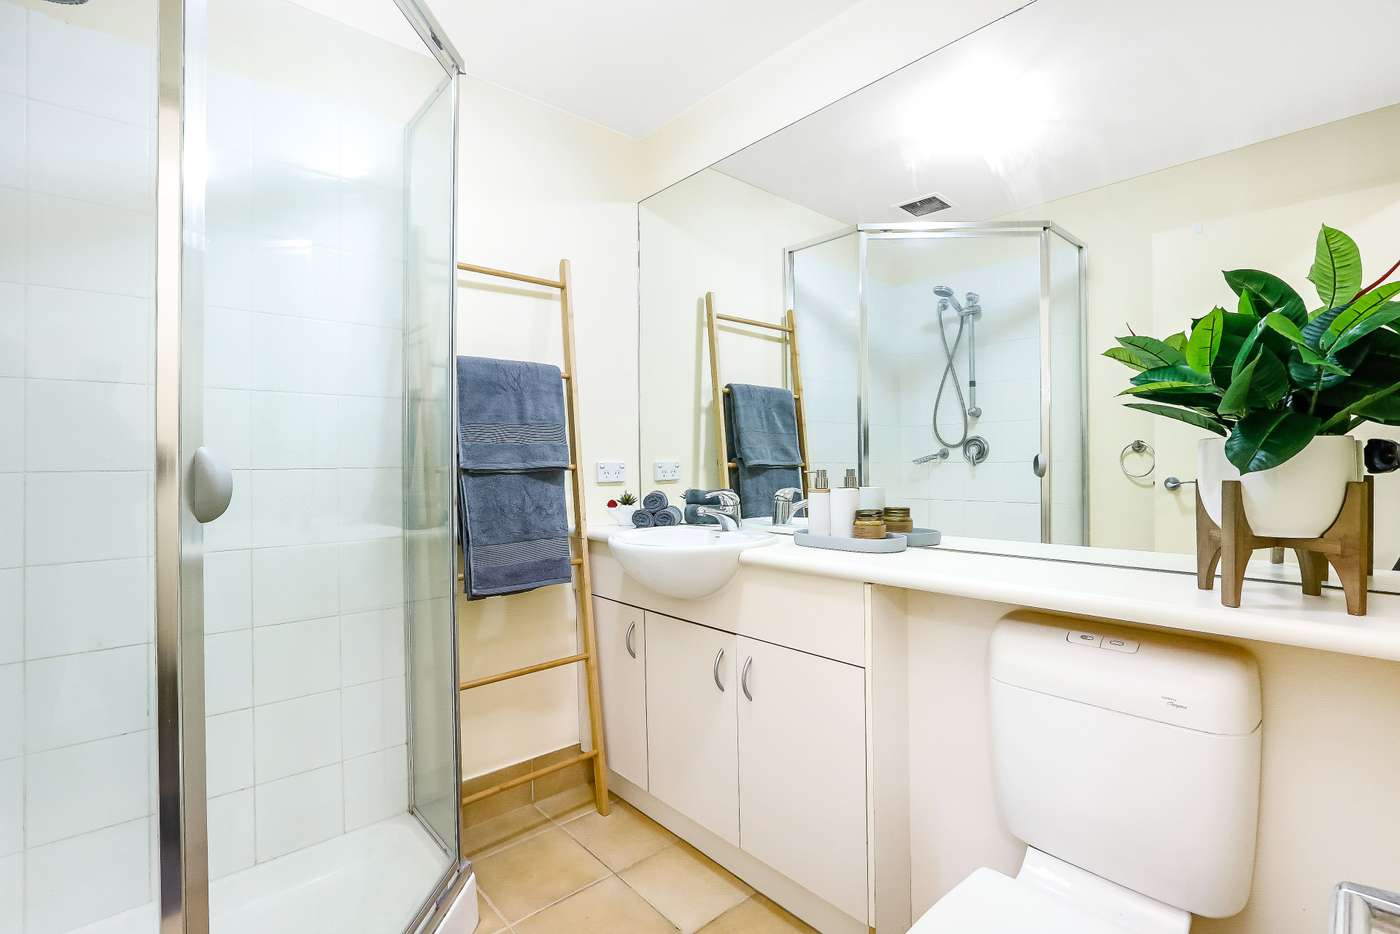 Sixth view of Homely apartment listing, 5119/570 Lygon Street, Carlton VIC 3053